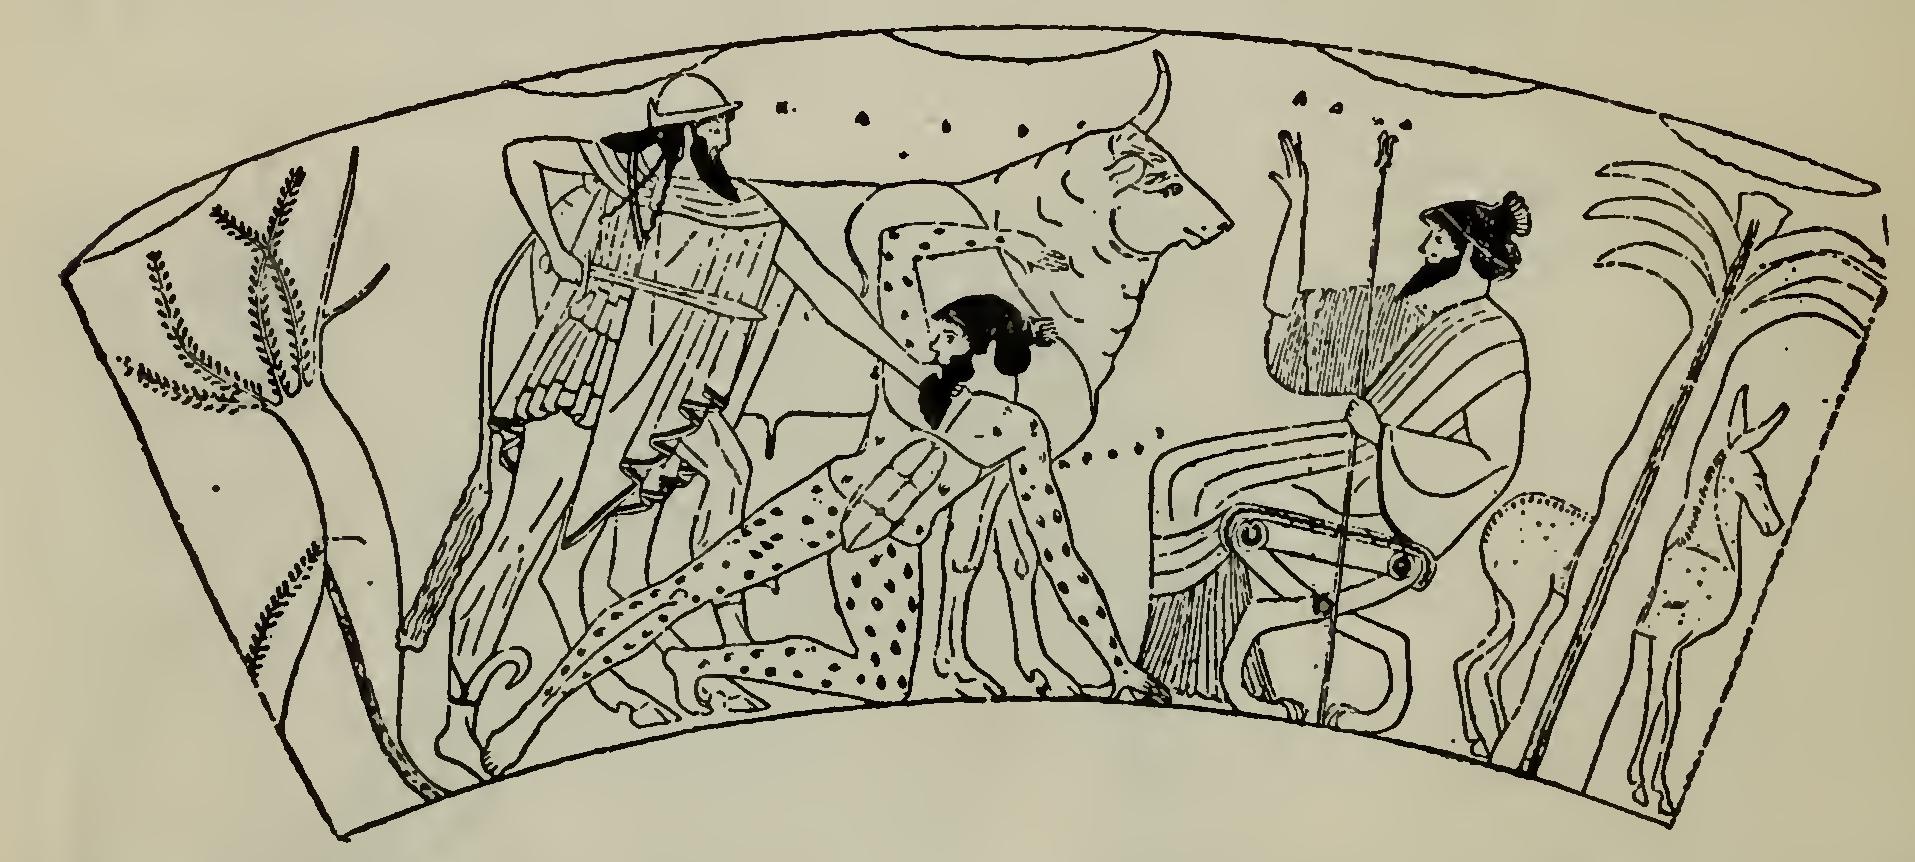 ley classic myths 1898 fig034